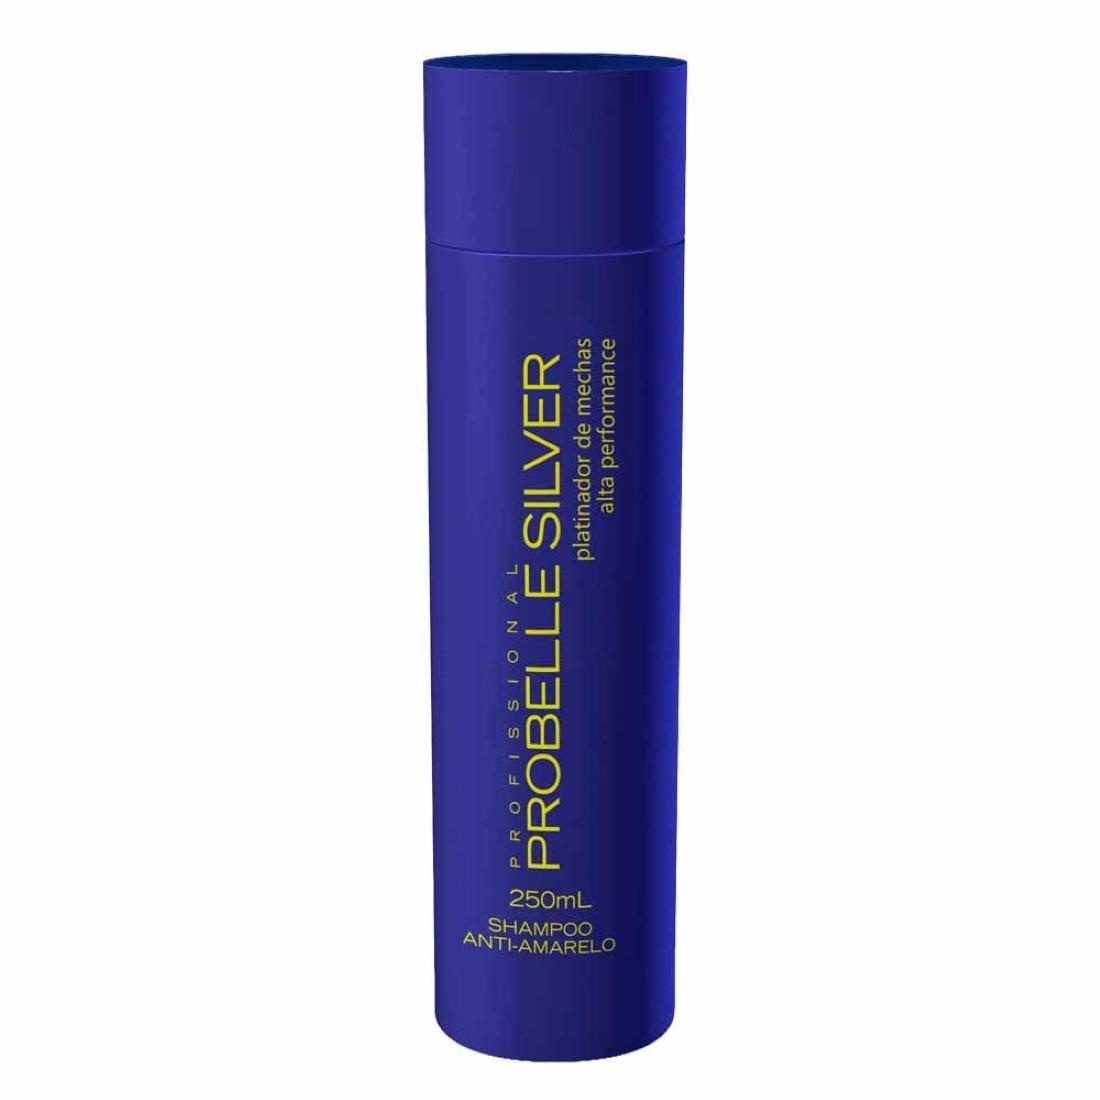 Shampoo Silver Anti-Amarelo 250ml - Probelle Profissional